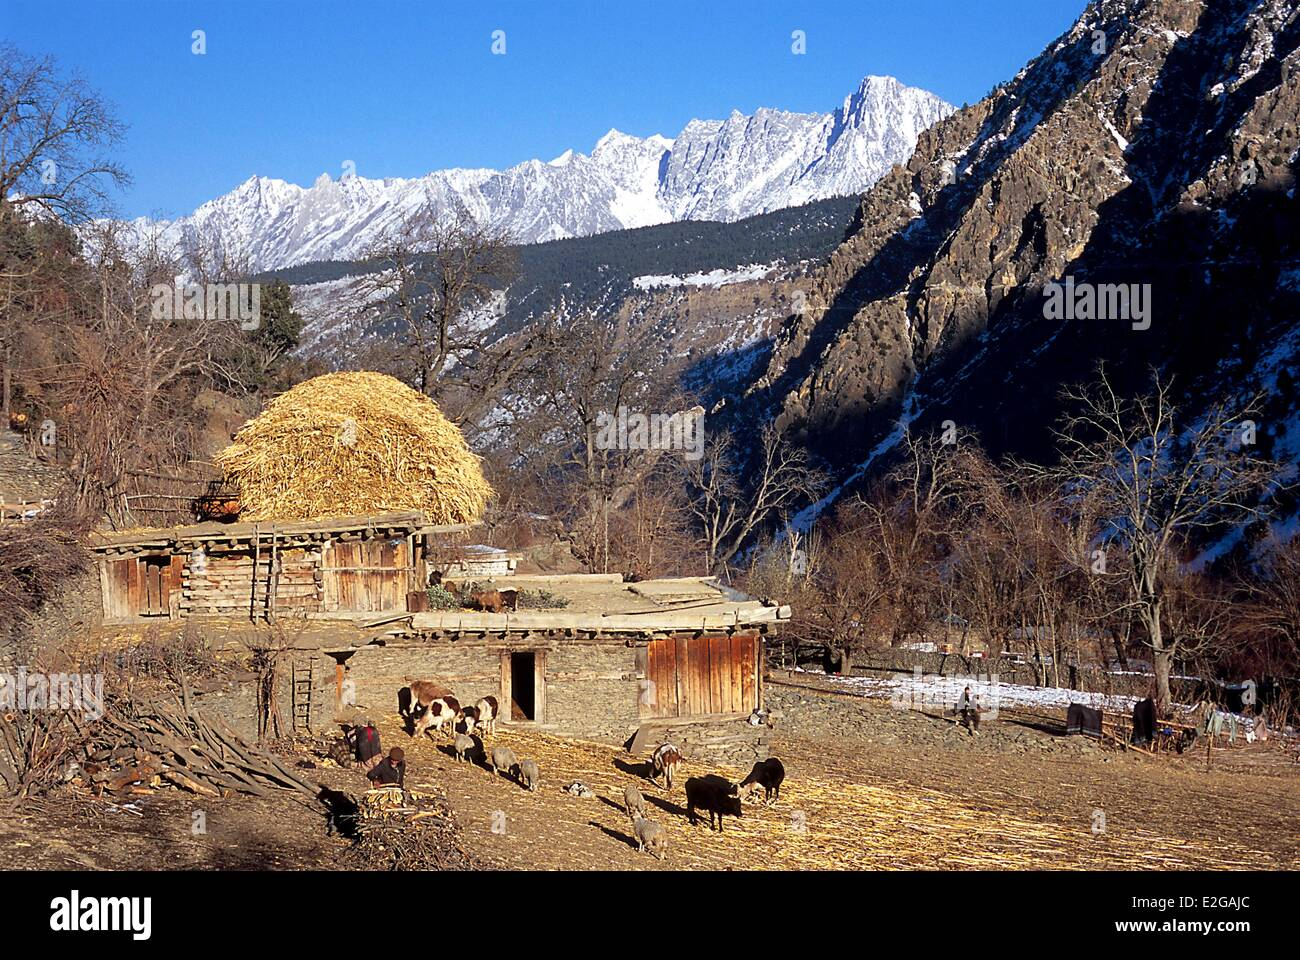 Pakistan Khyber Pakhtunkhwa Kalash valleys Bumburet valley downstream cowshed of the Krakal village (2 150 m) - Stock Image